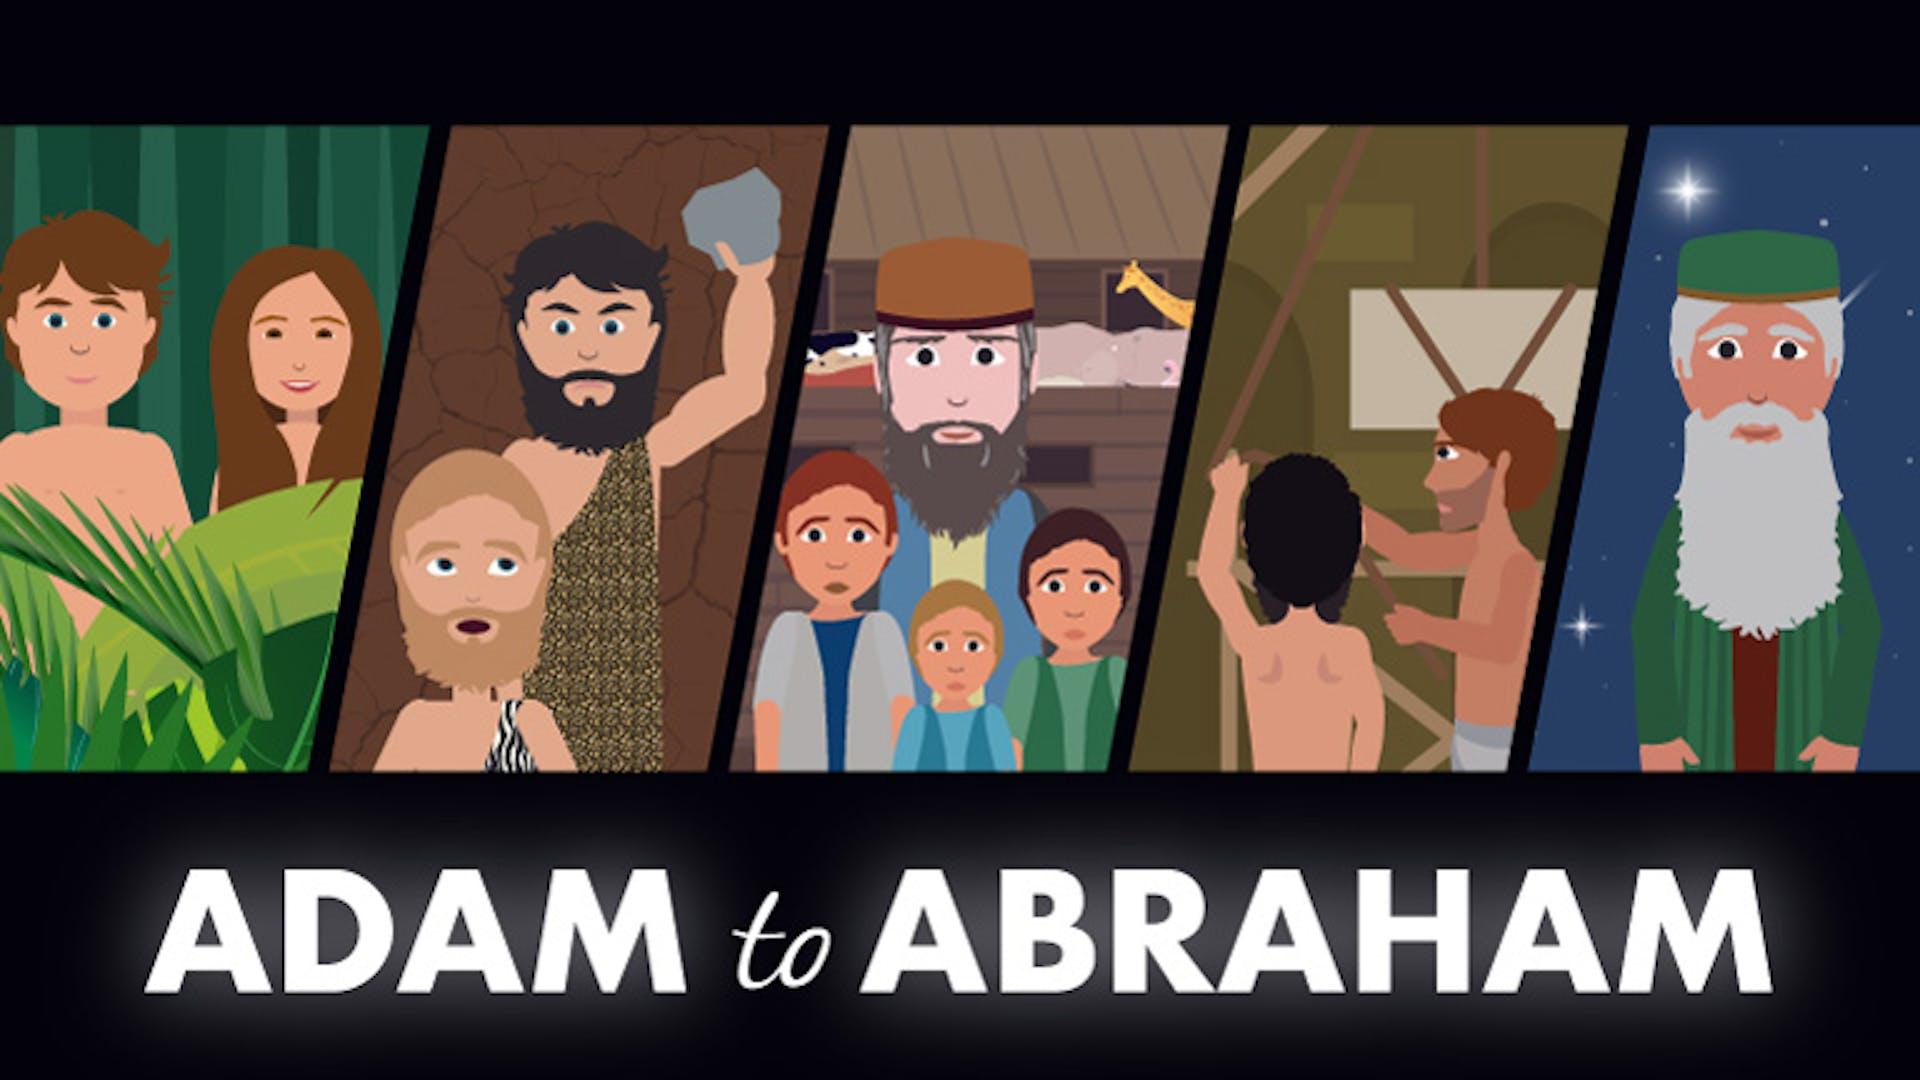 Abraham Genesis history